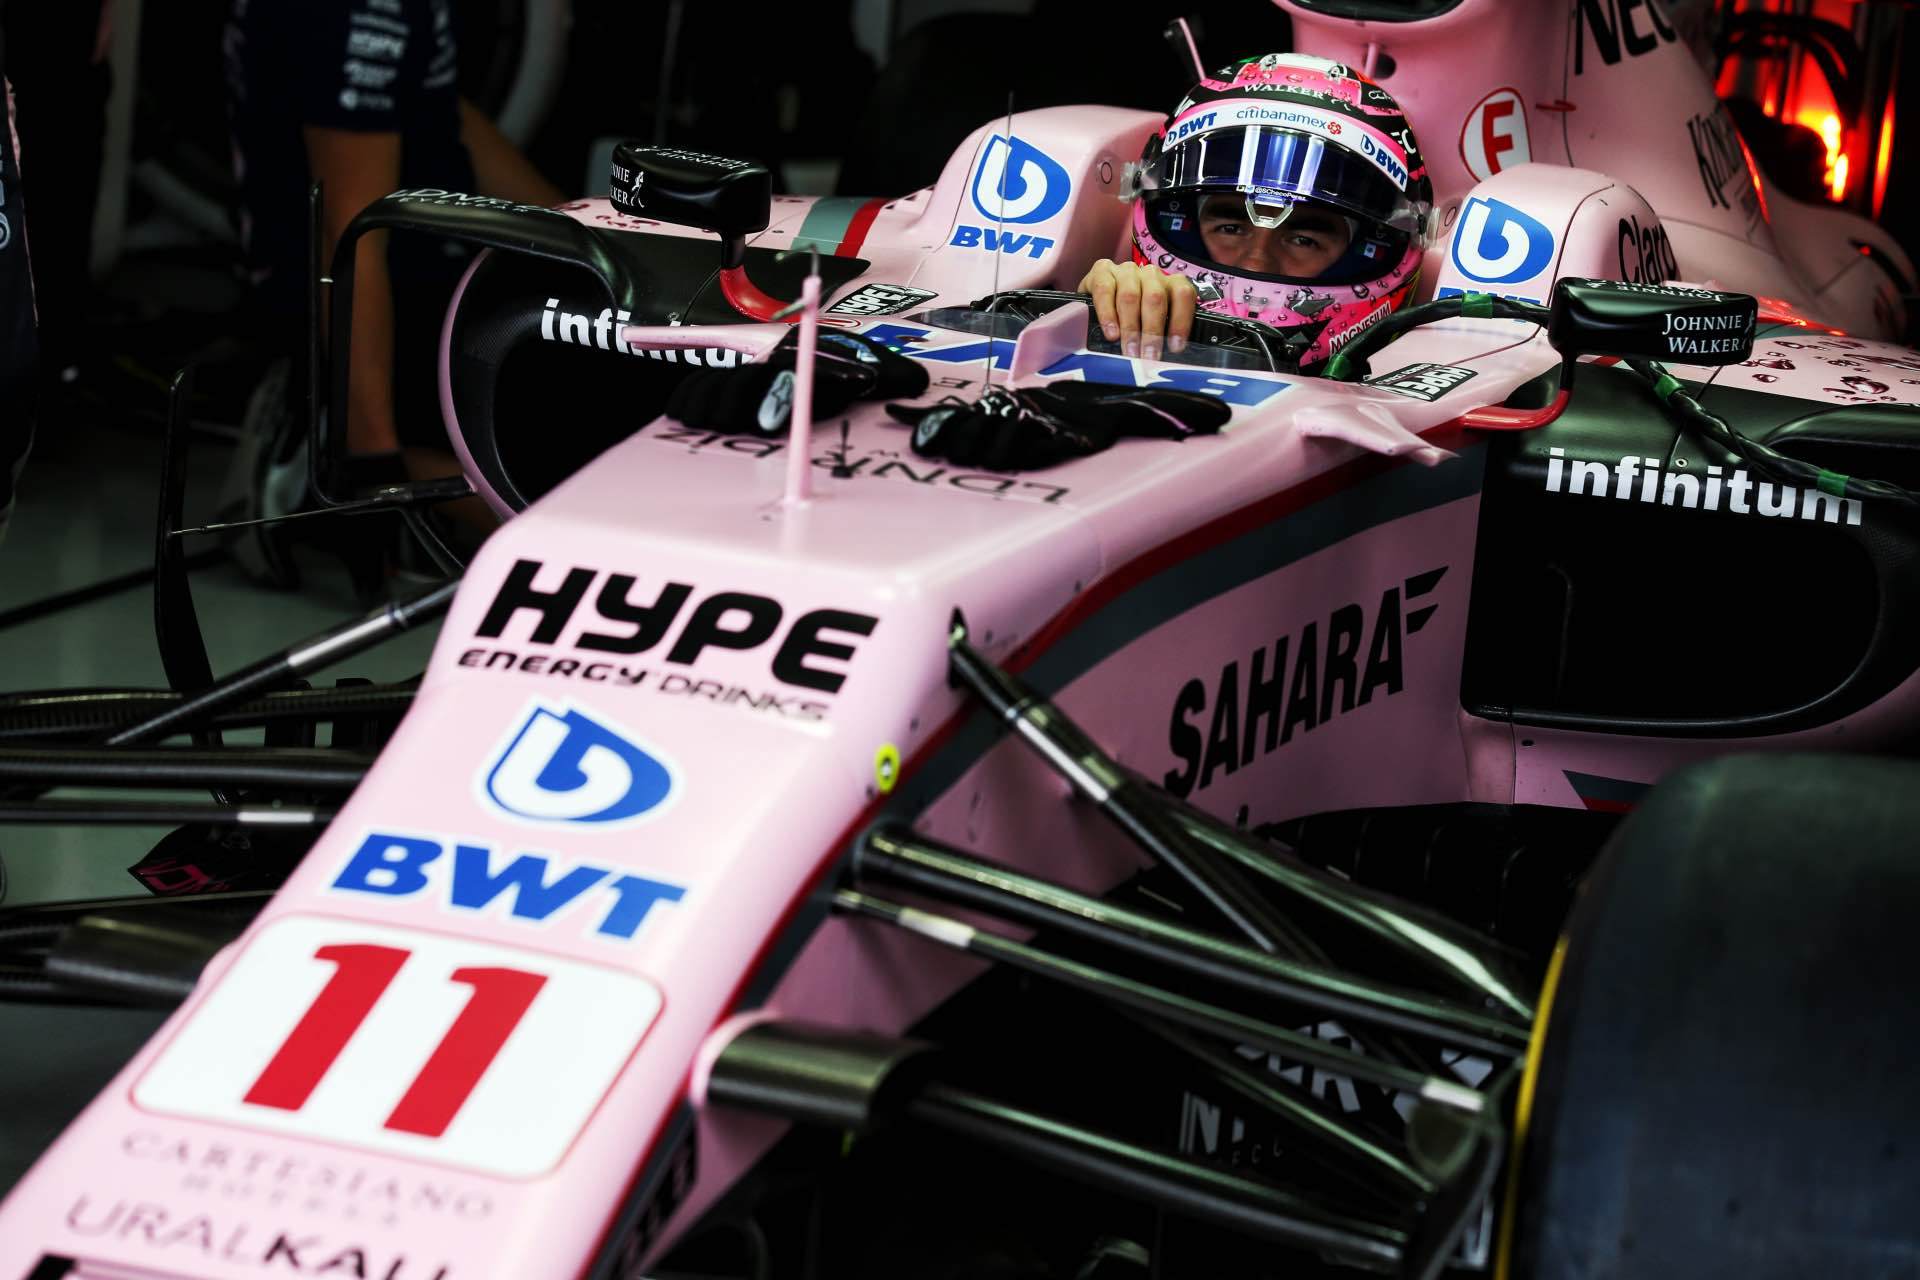 Motor Racing - Formula One World Championship - Brazilian Grand Prix - Qualifying Day - Sao Paulo, Brazil